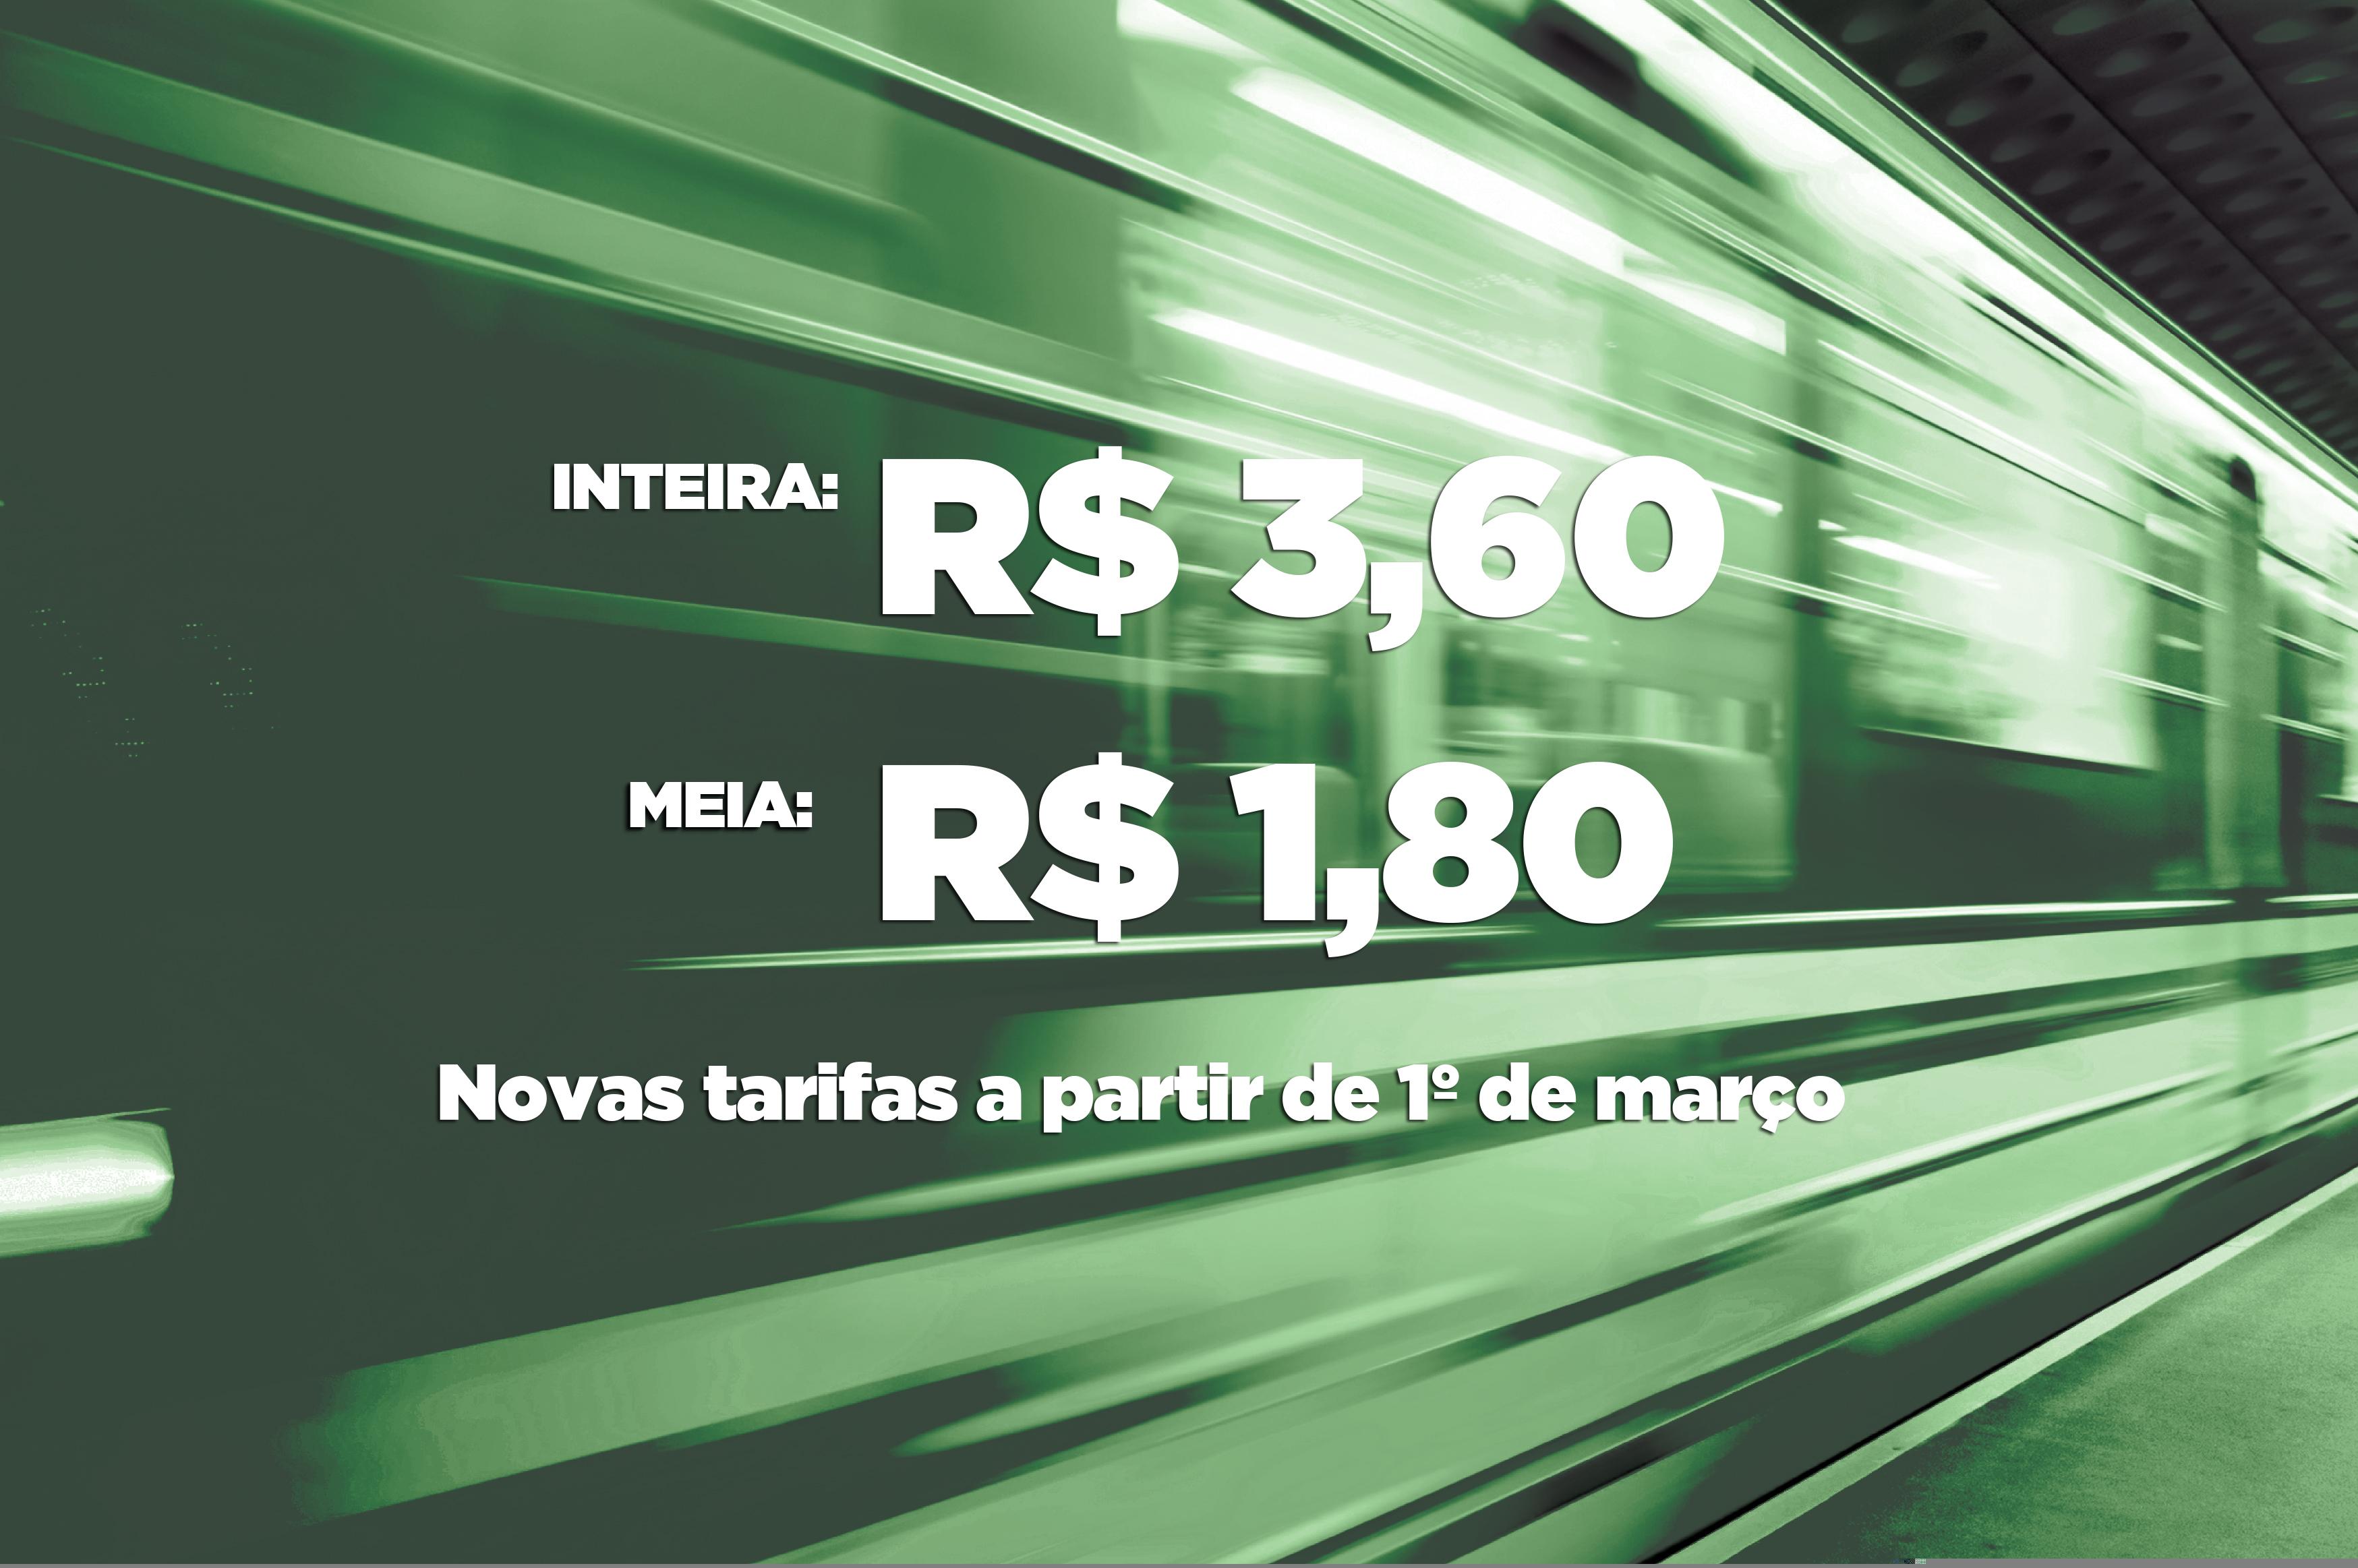 Linha Sul do Metrô de Fortaleza terá tarifa reajustada a partir de sexta-feira (1°/3)